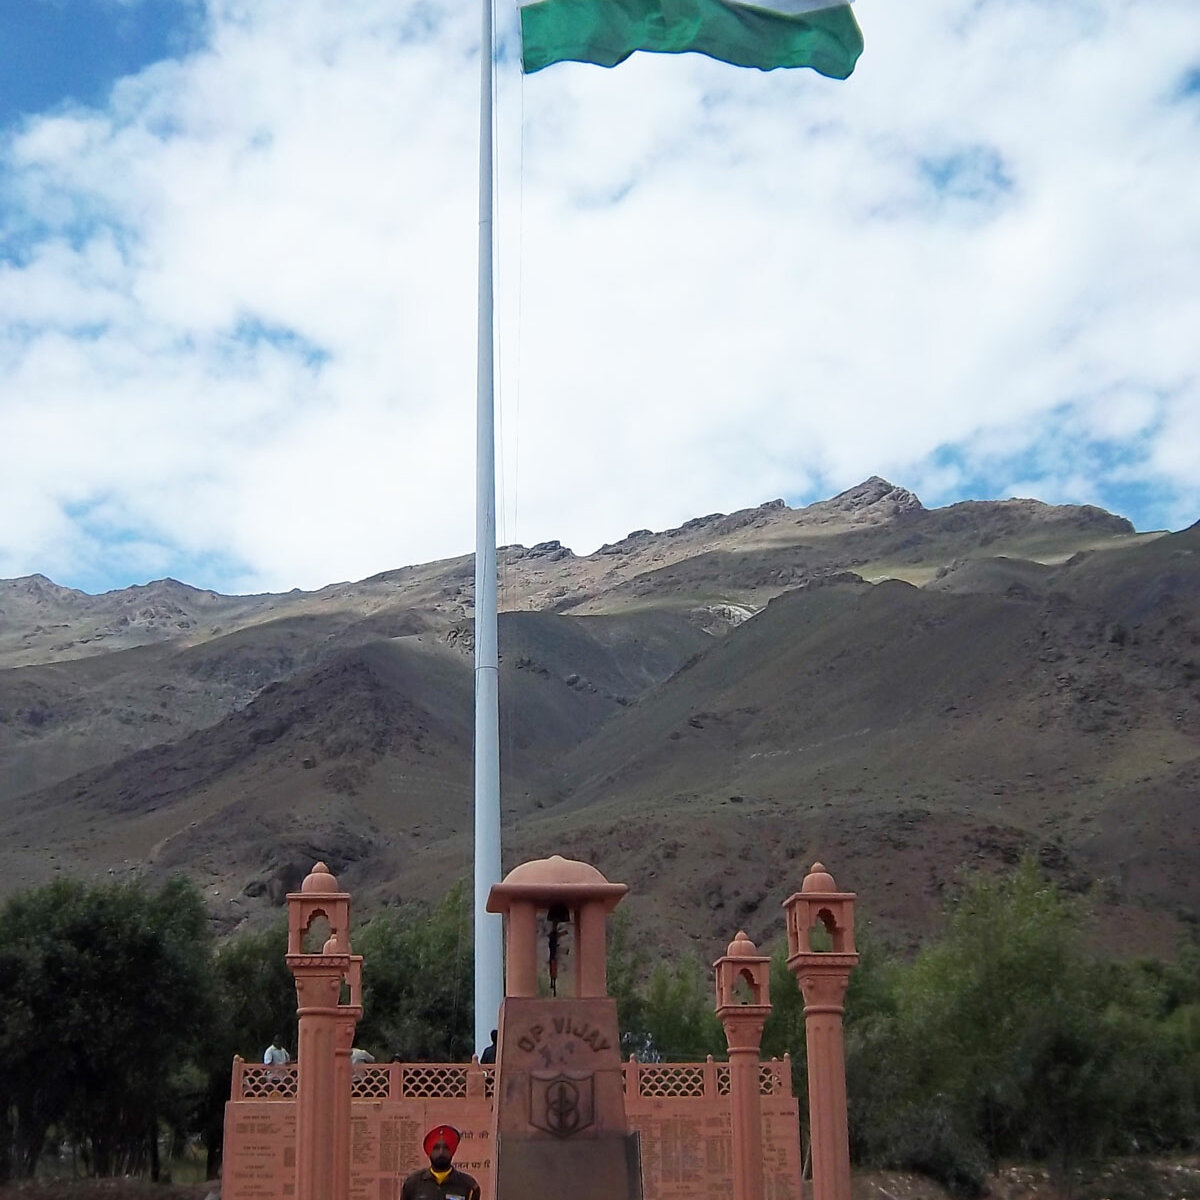 Monumental Giant Indian Flag of 20ft x 30ft at Dras, Kargil War Memorial